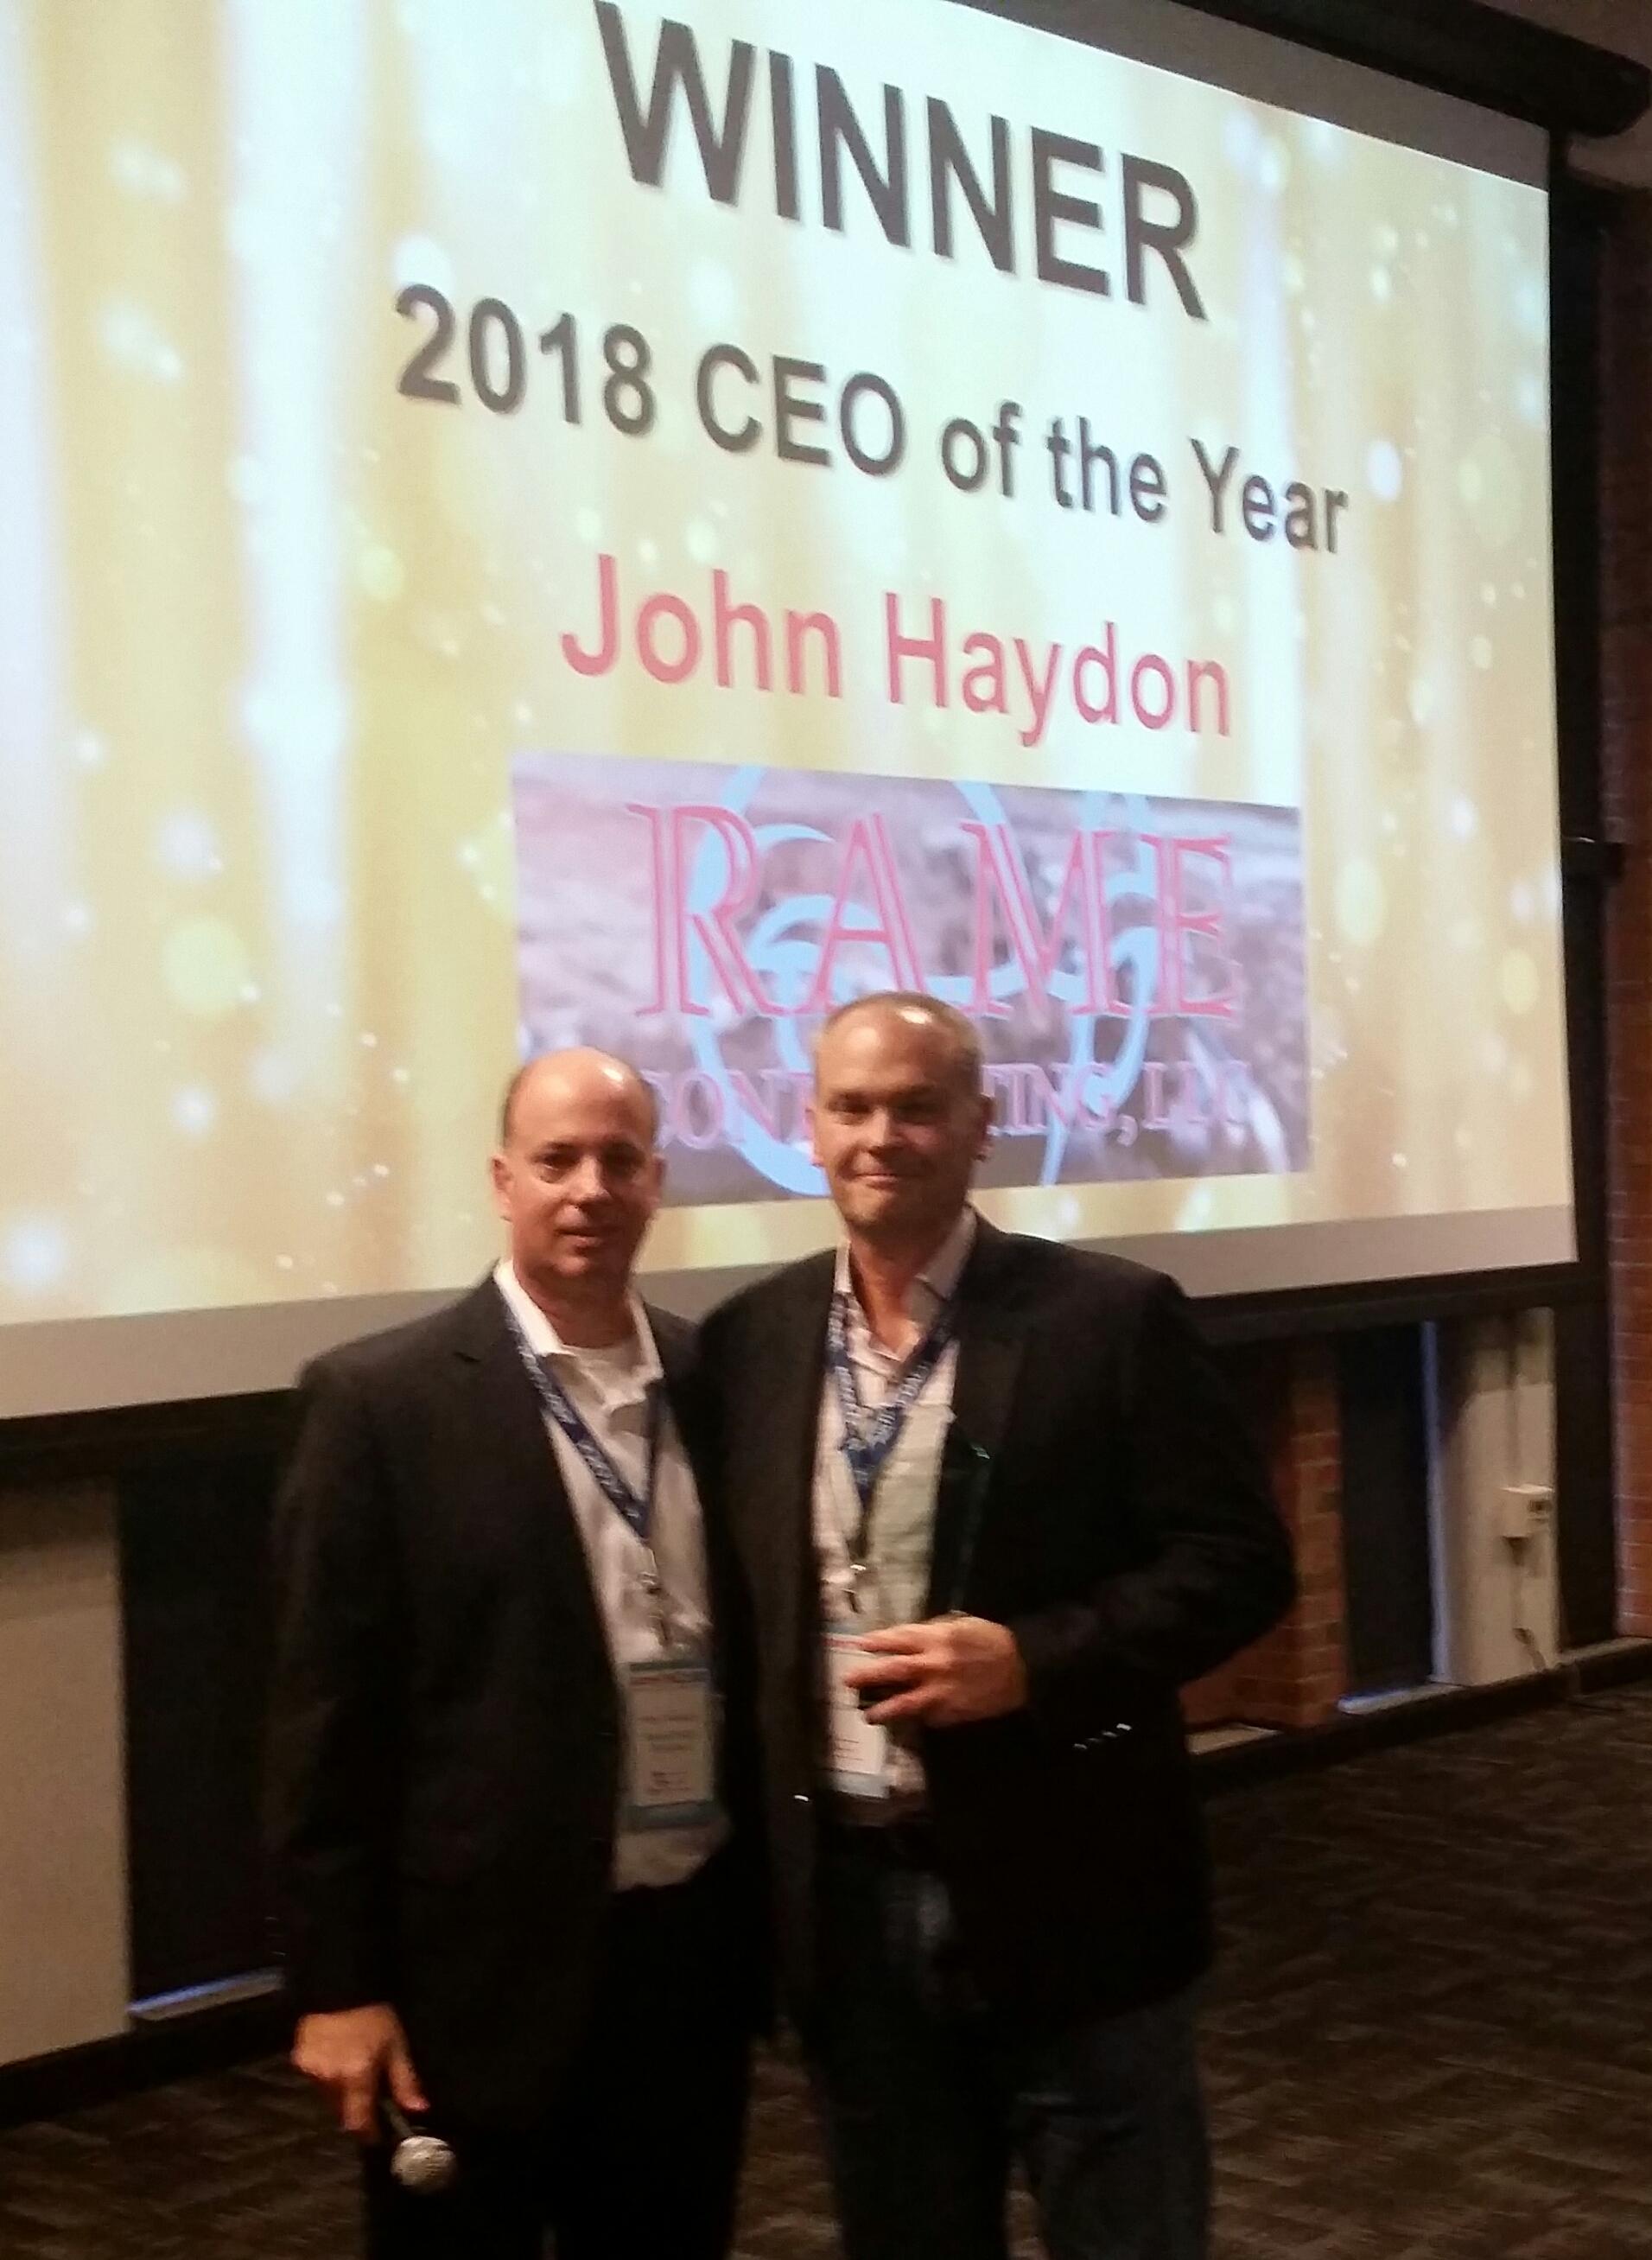 John Haydon CEO Award.jpg